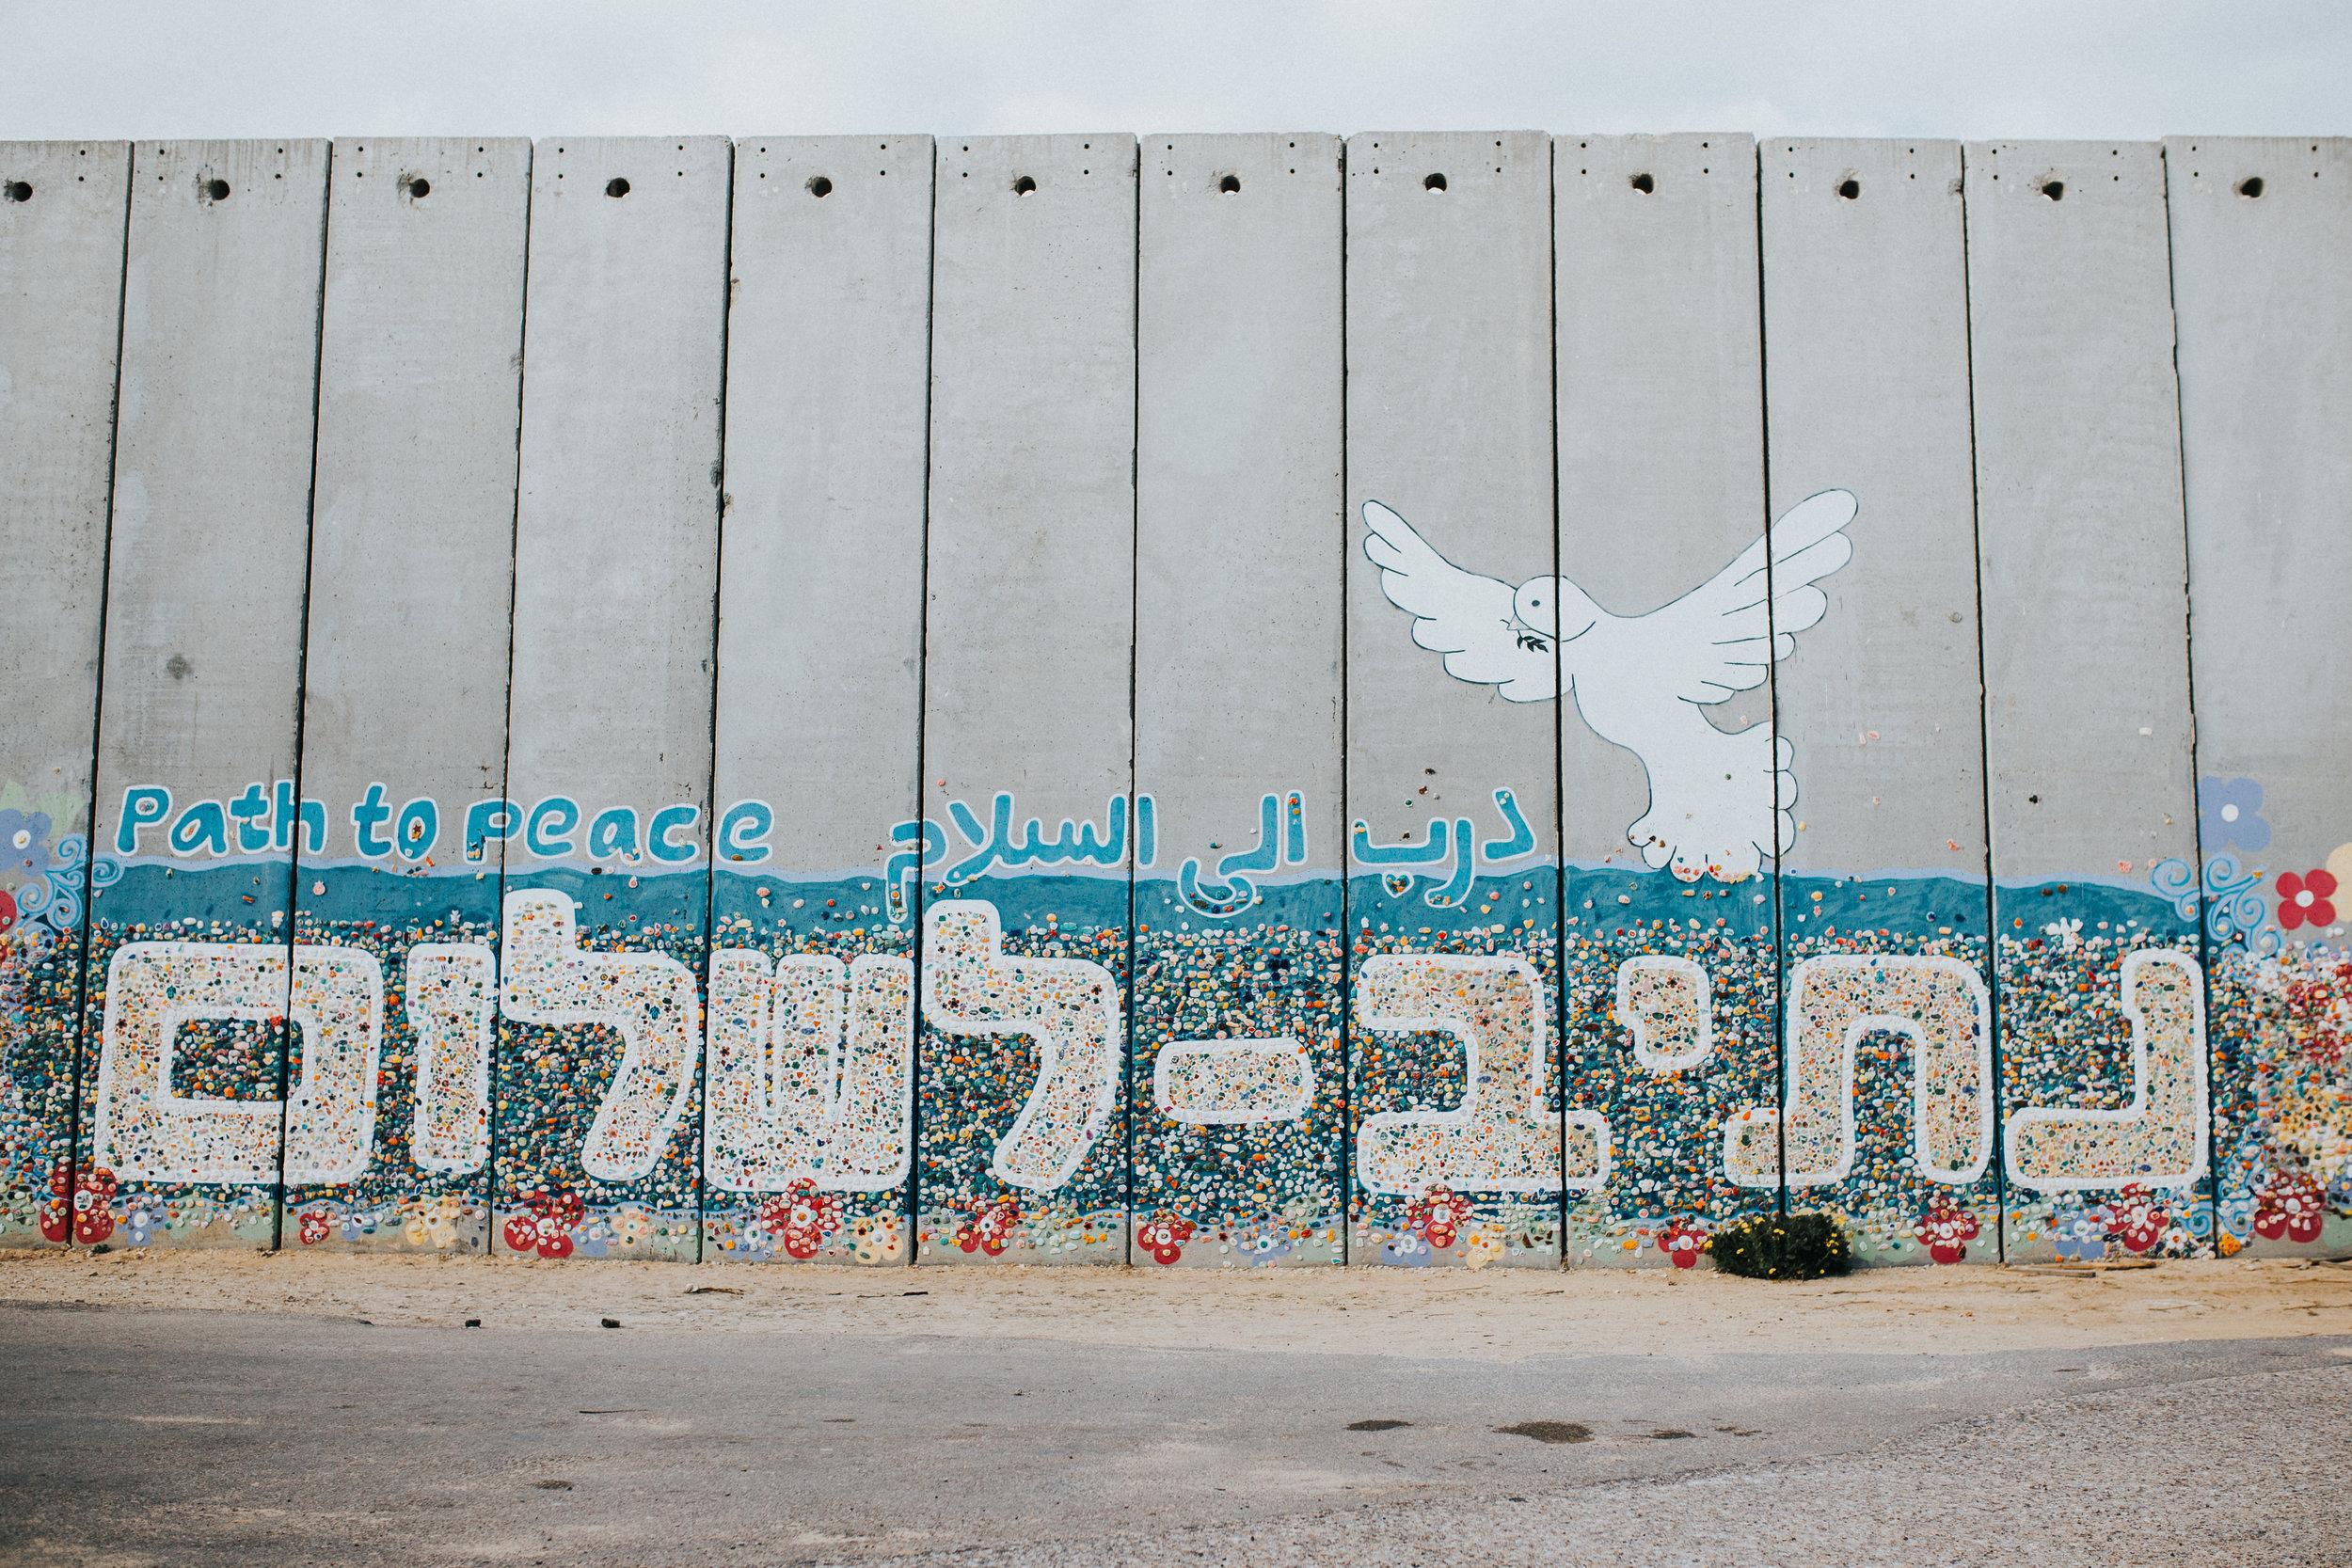 MARCH 17 - 27, 2020 - Israel & Jordan